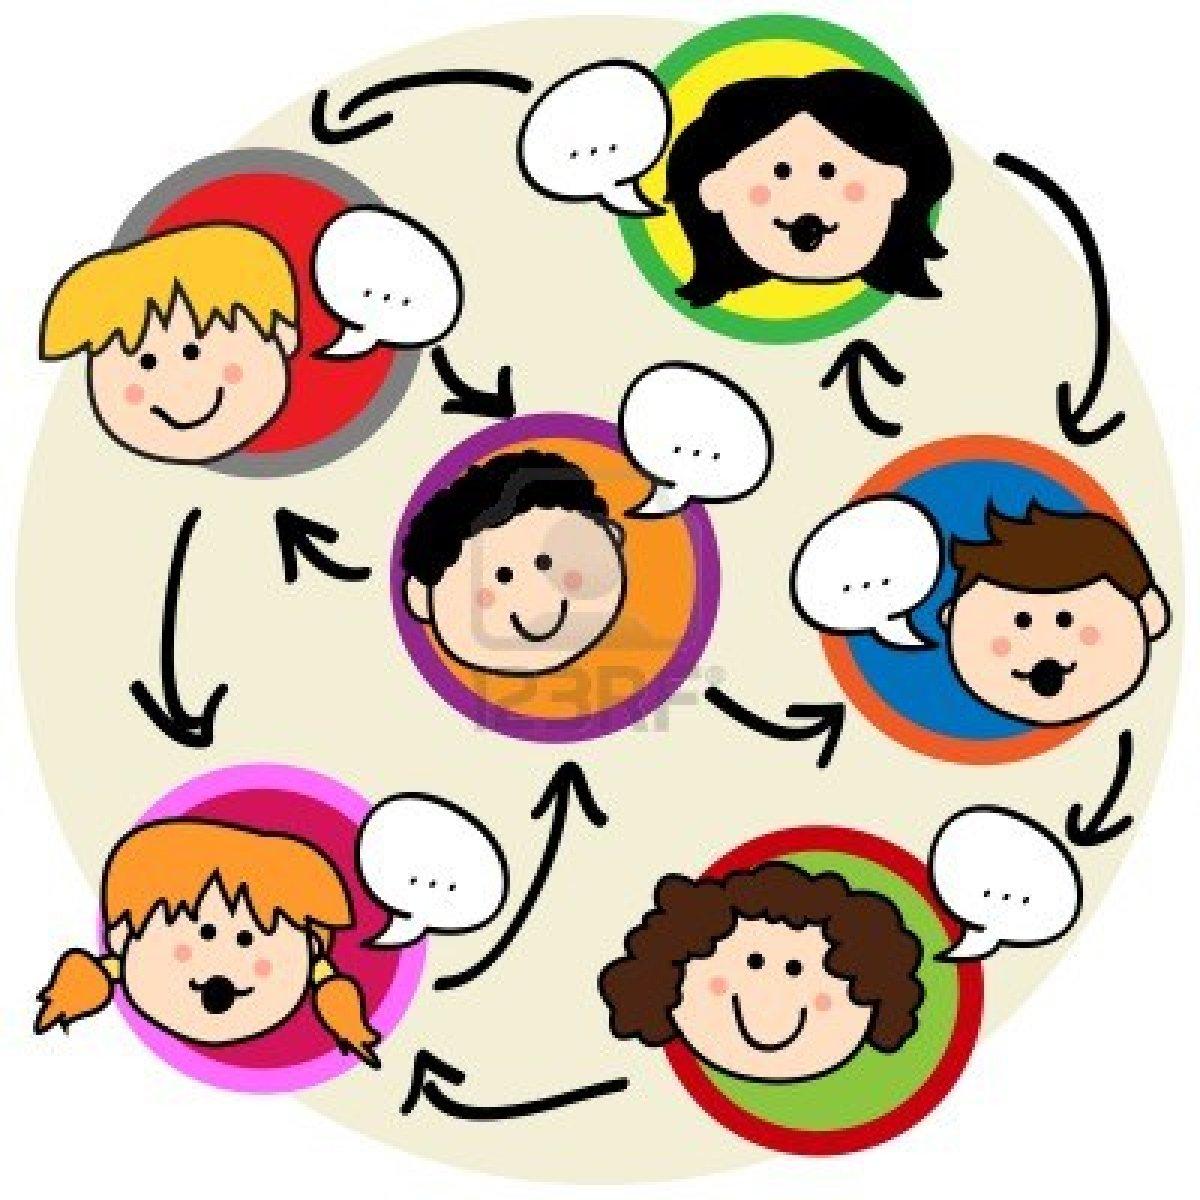 Kids Talking Clipart & Kids Talking Clip Art Images.